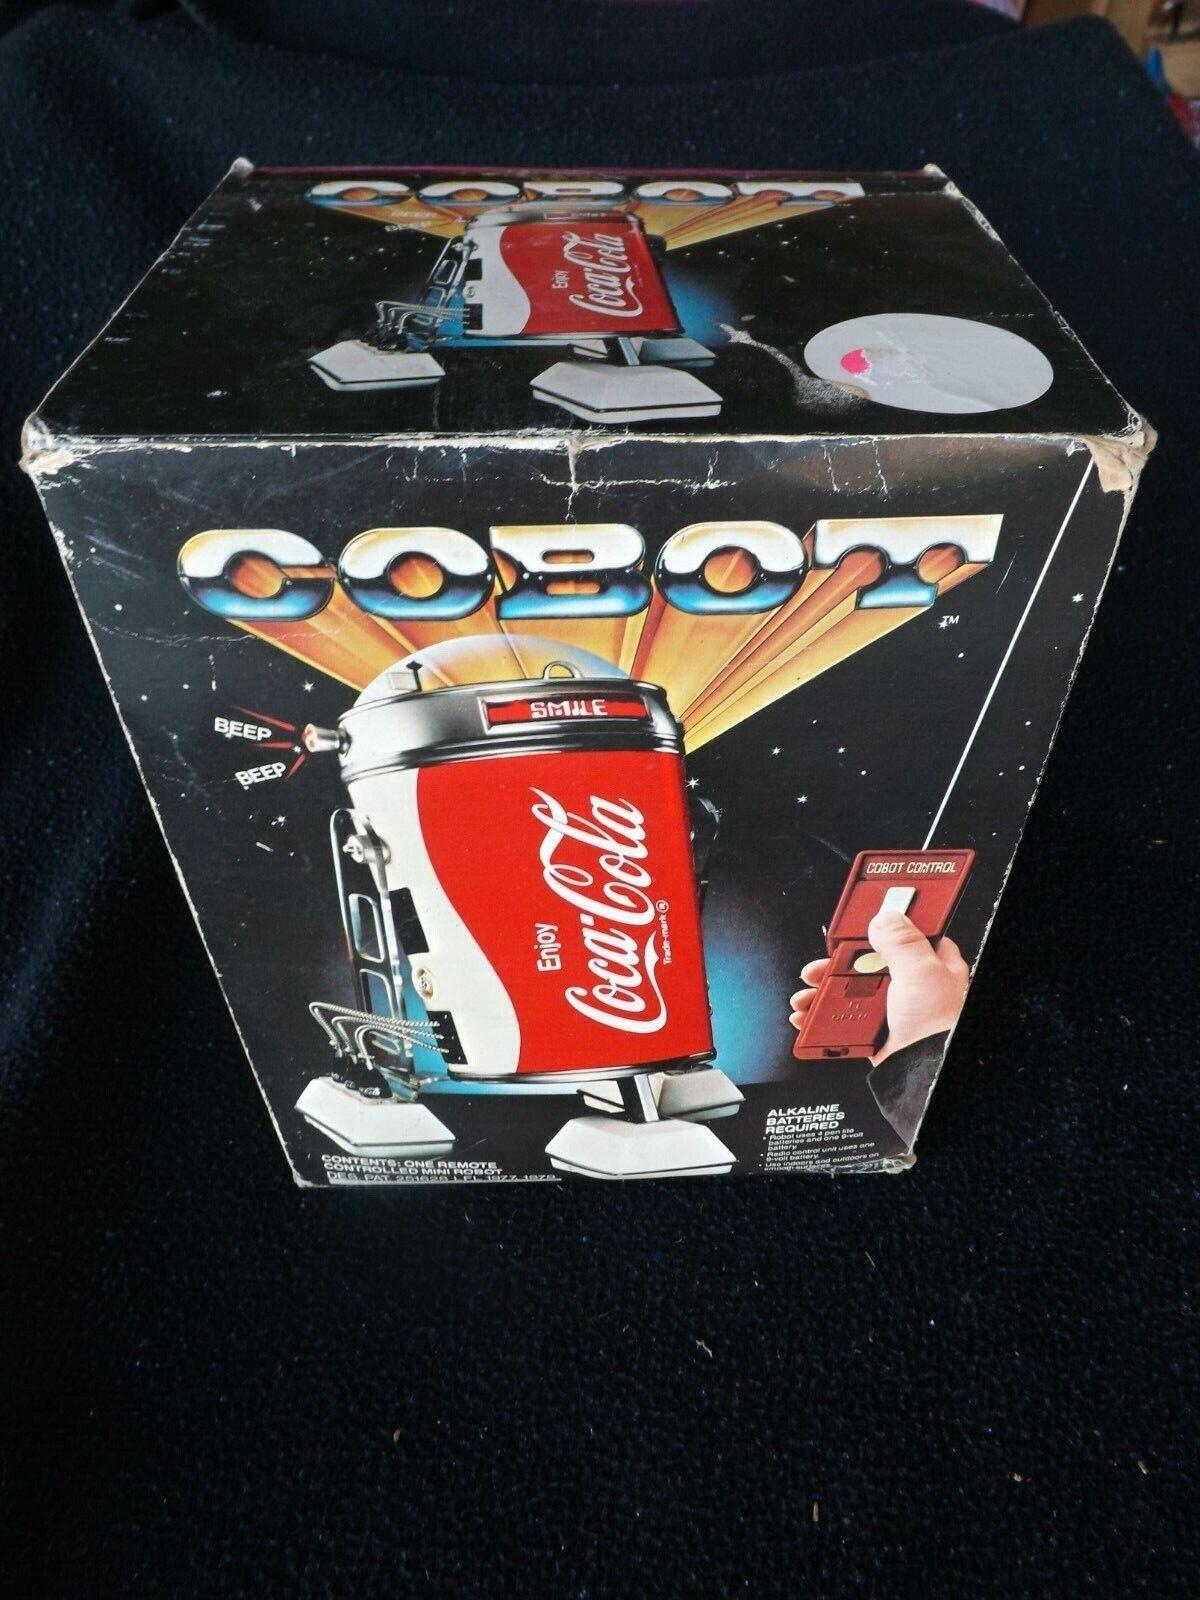 Vintage 1970's Coca-Cola Cobot R2-D2 Remote Control Can Robot Toy In Original Bo